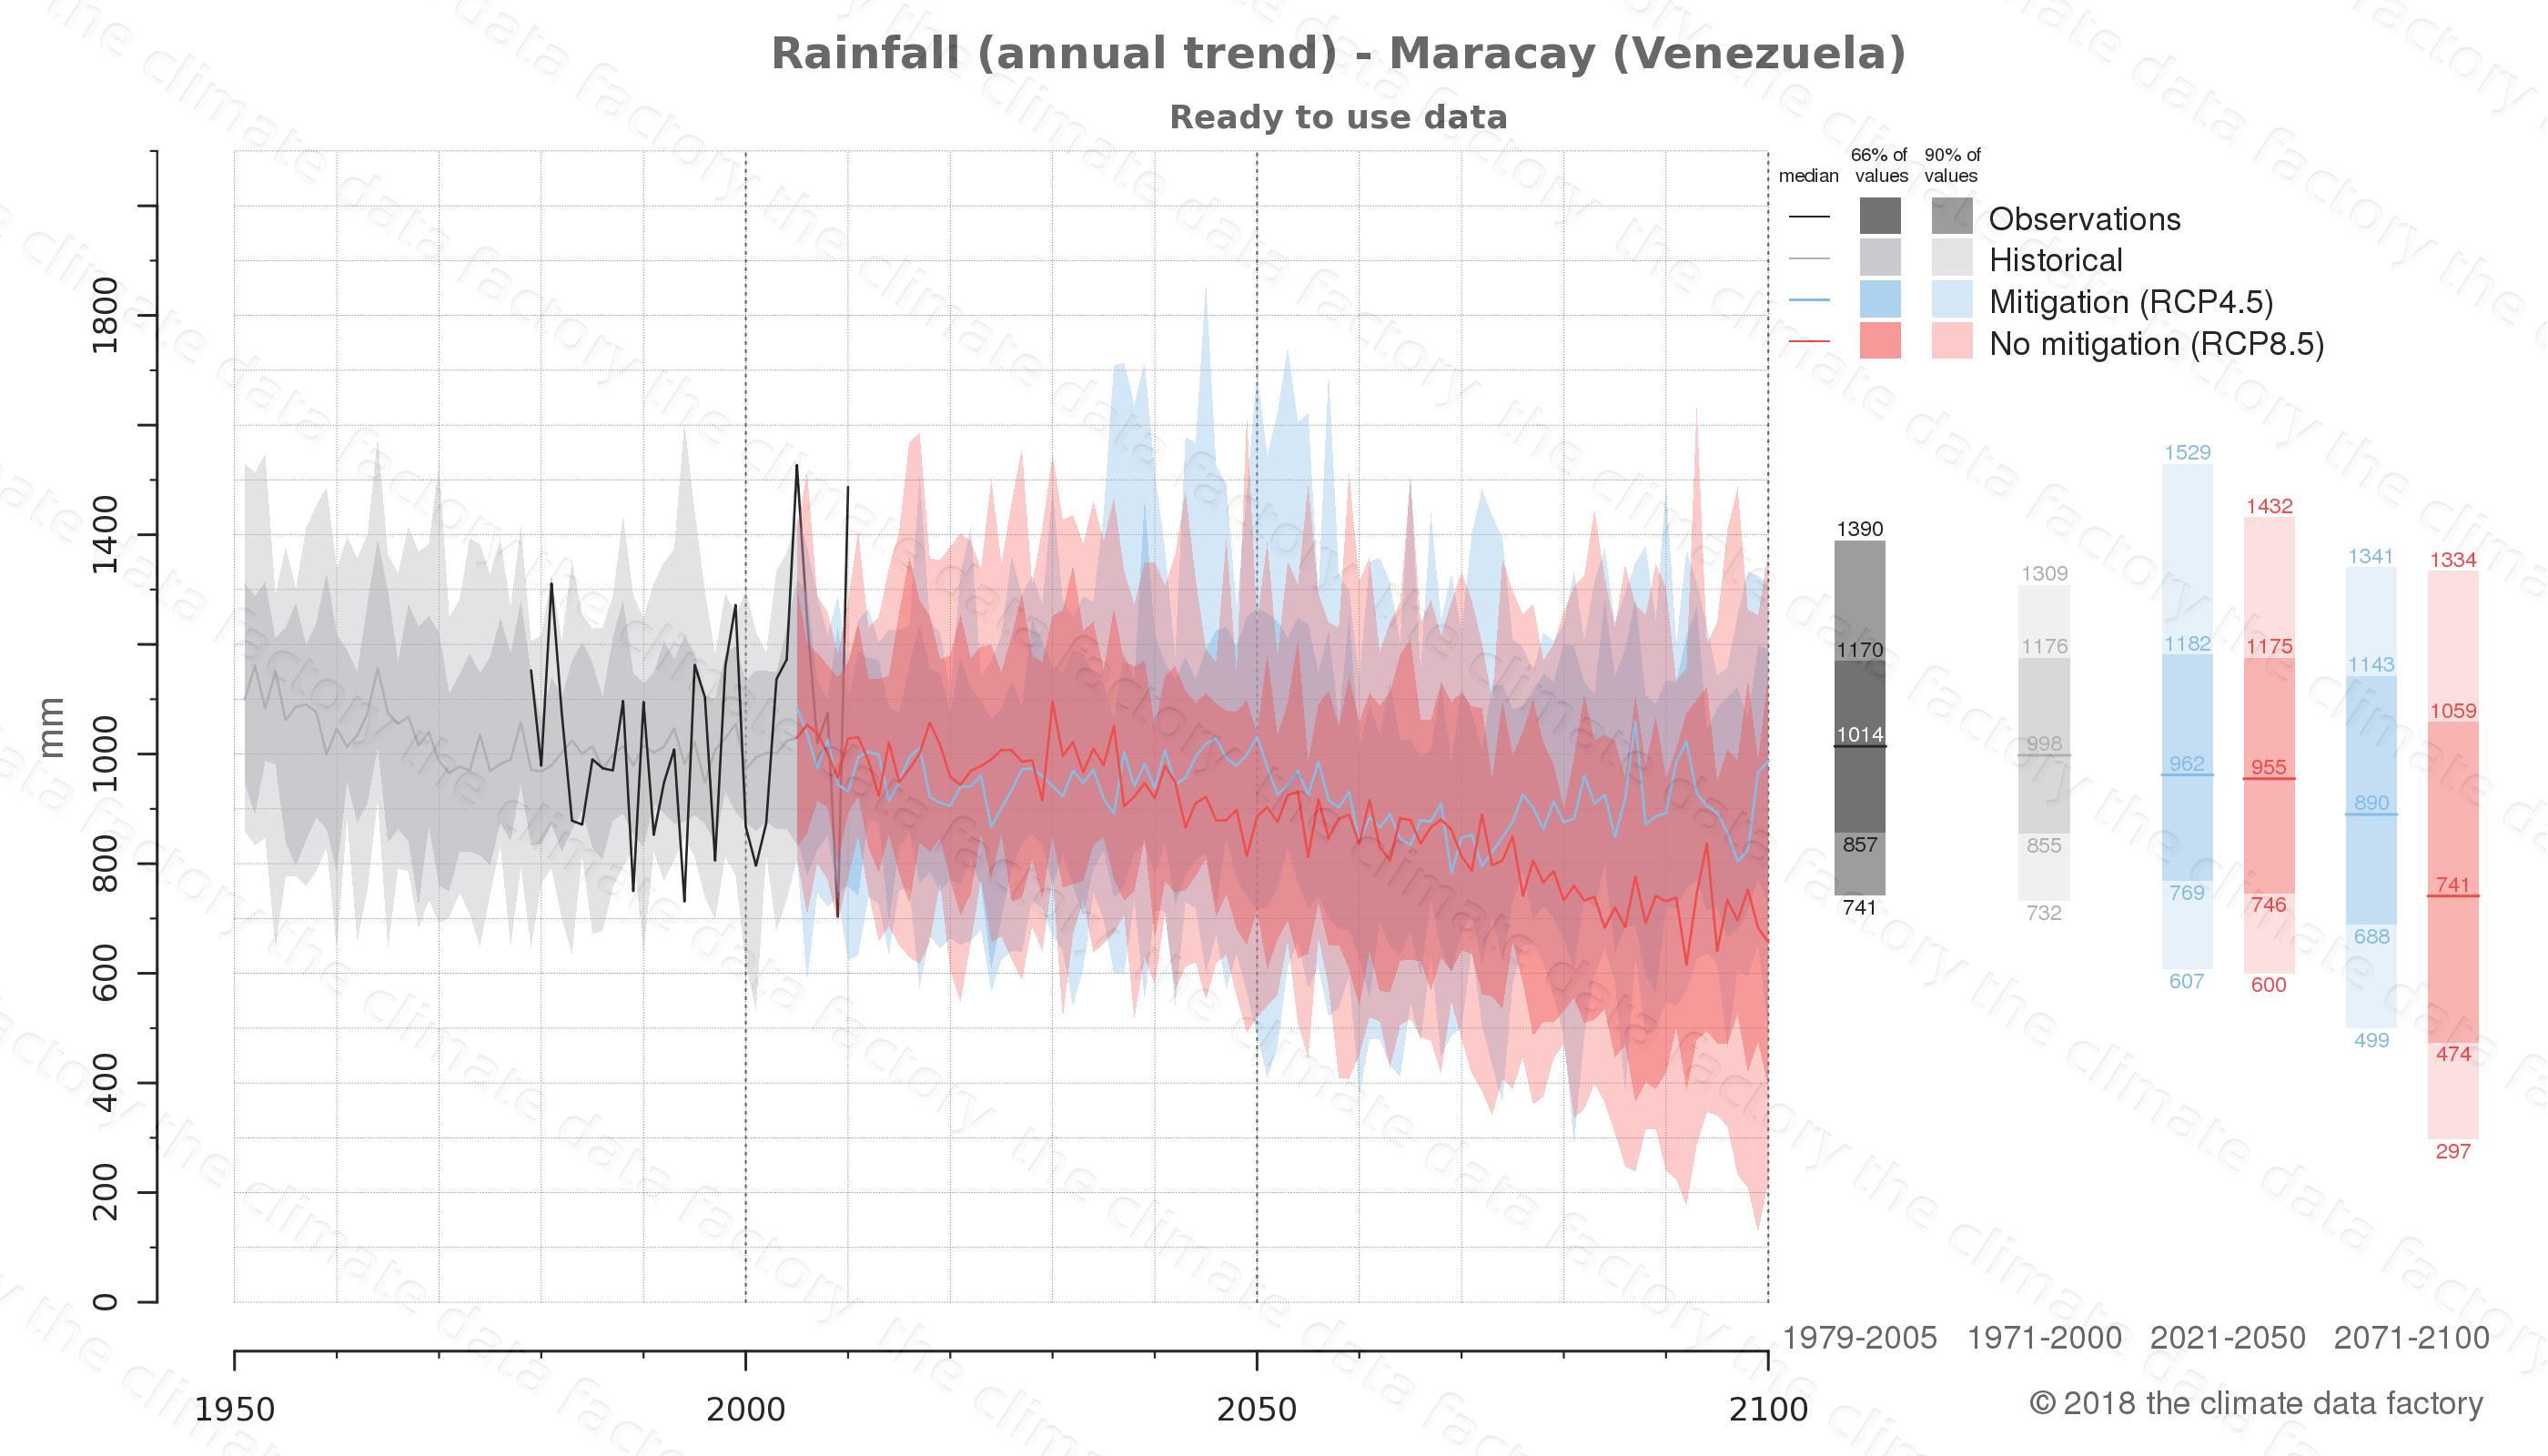 climate change data policy adaptation climate graph city data rainfall maracay venezuela